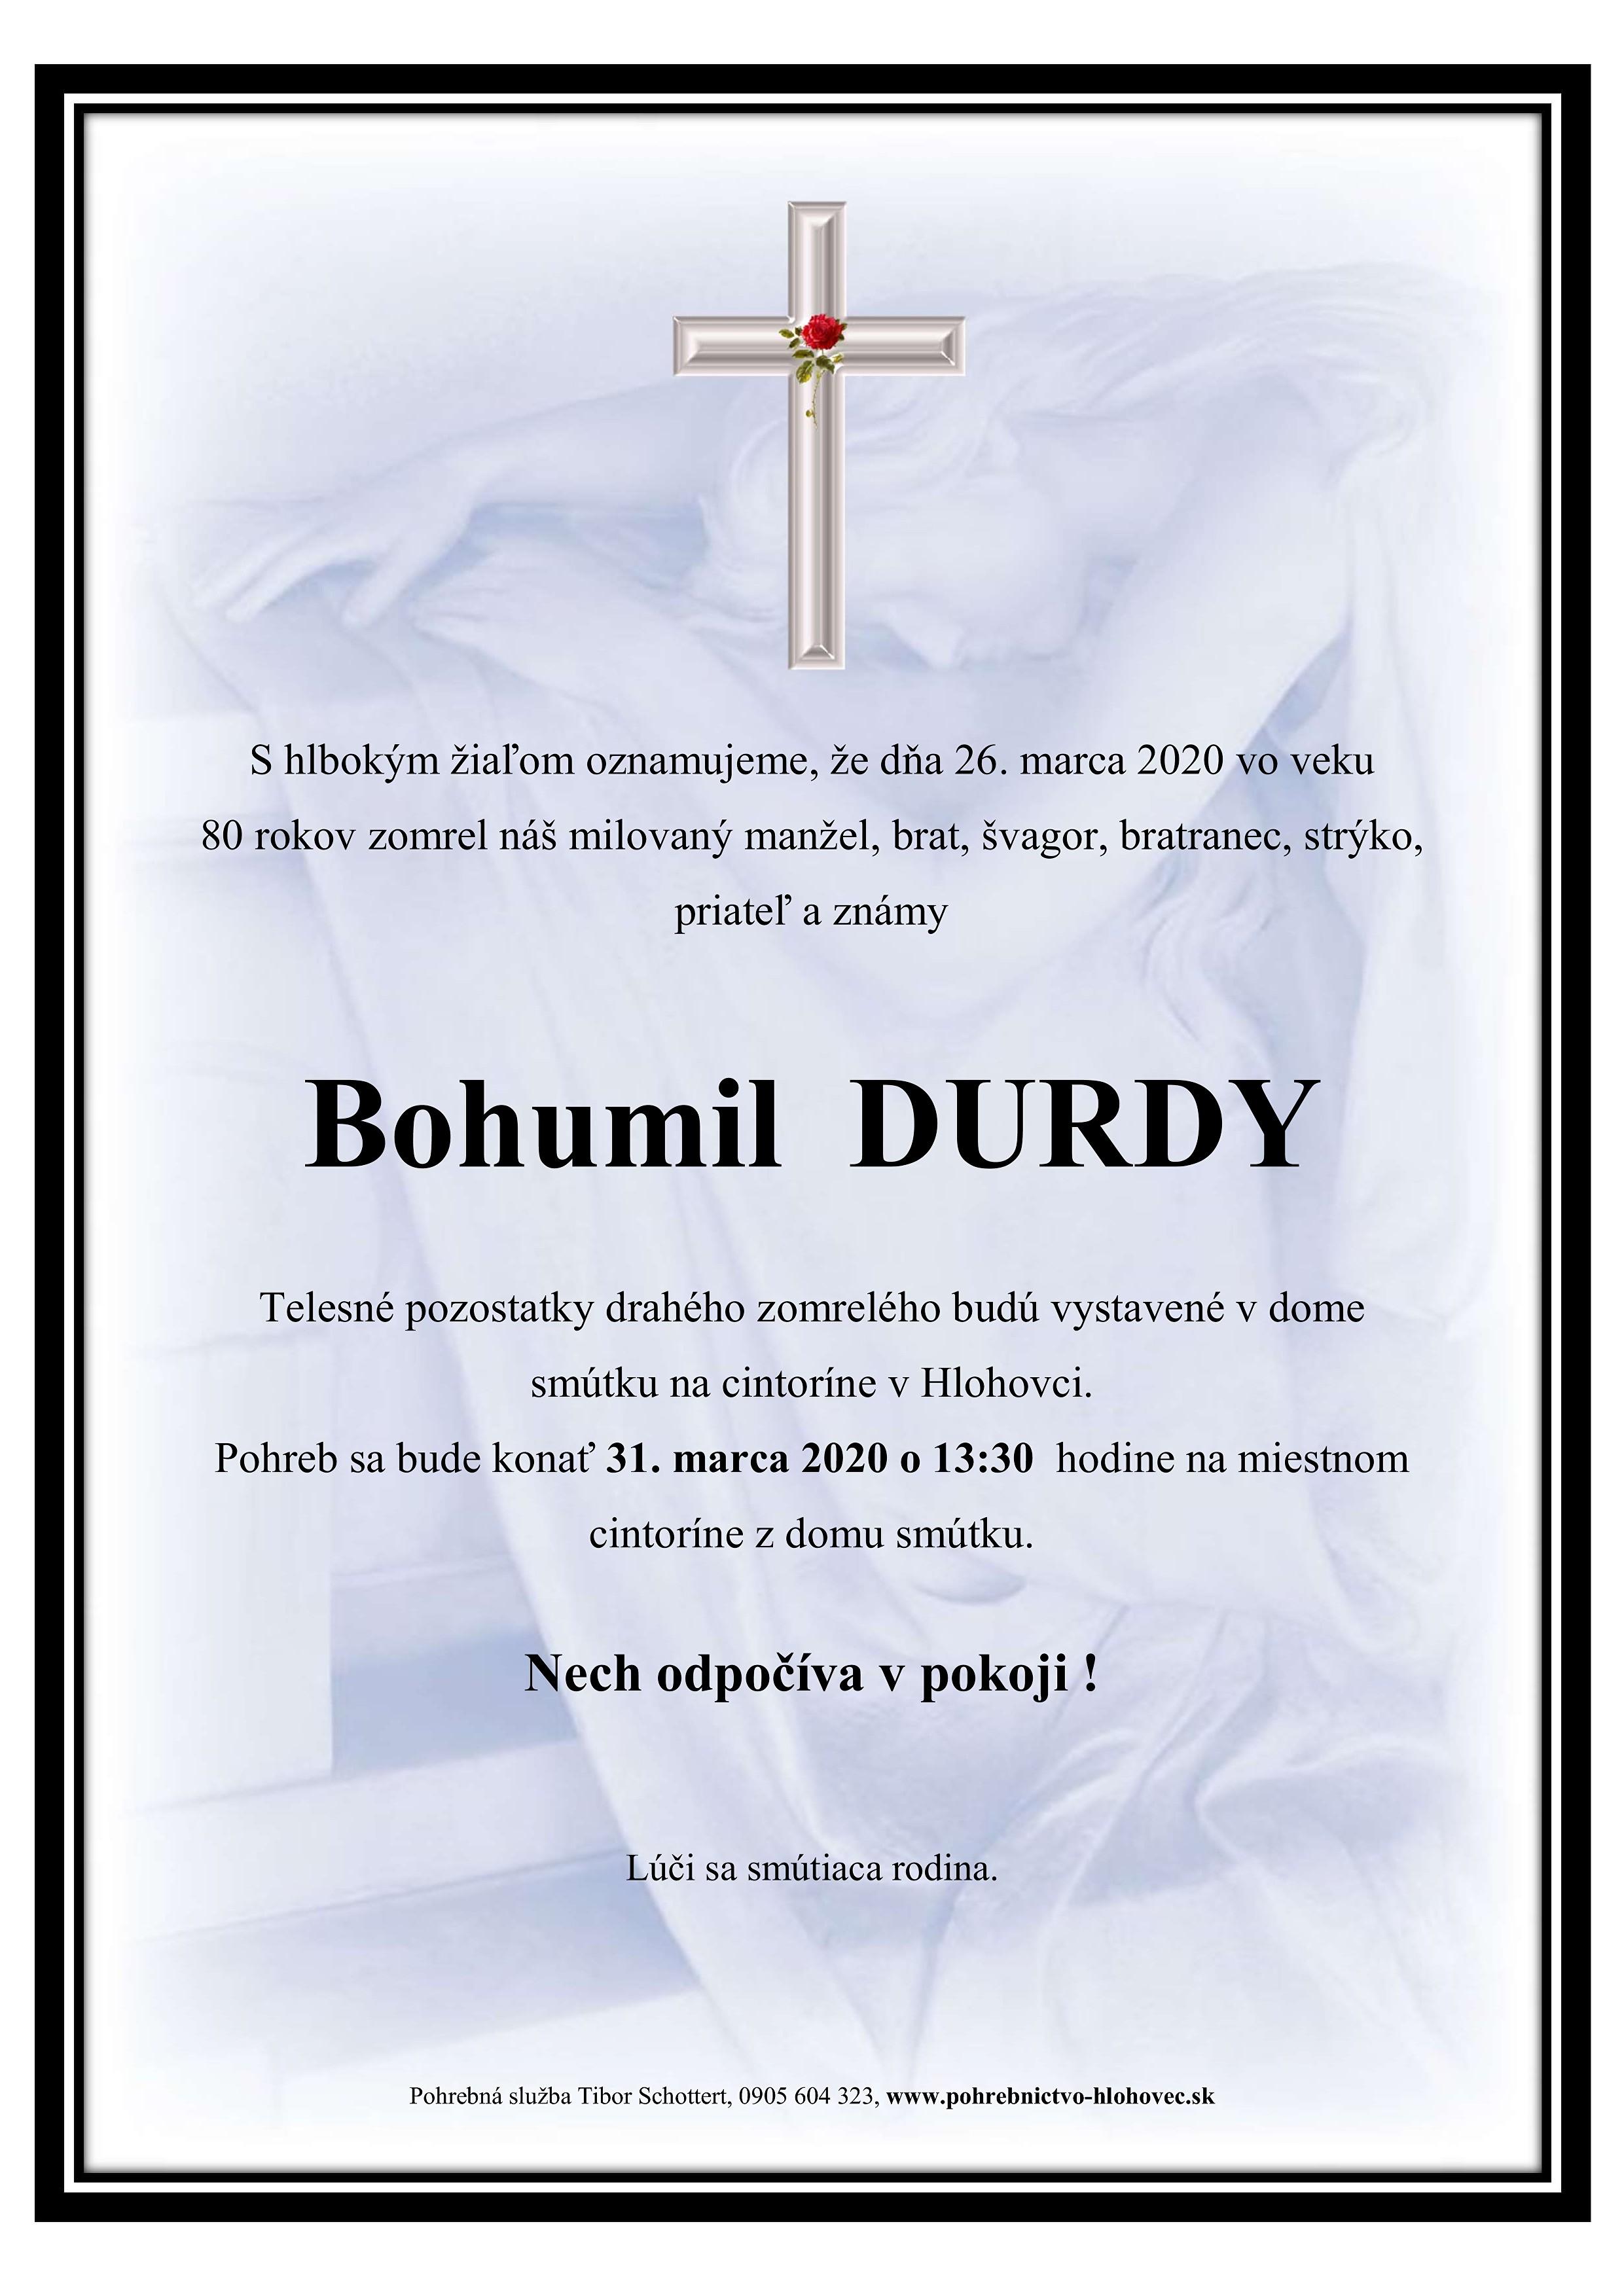 Bohumil Durdy Parte